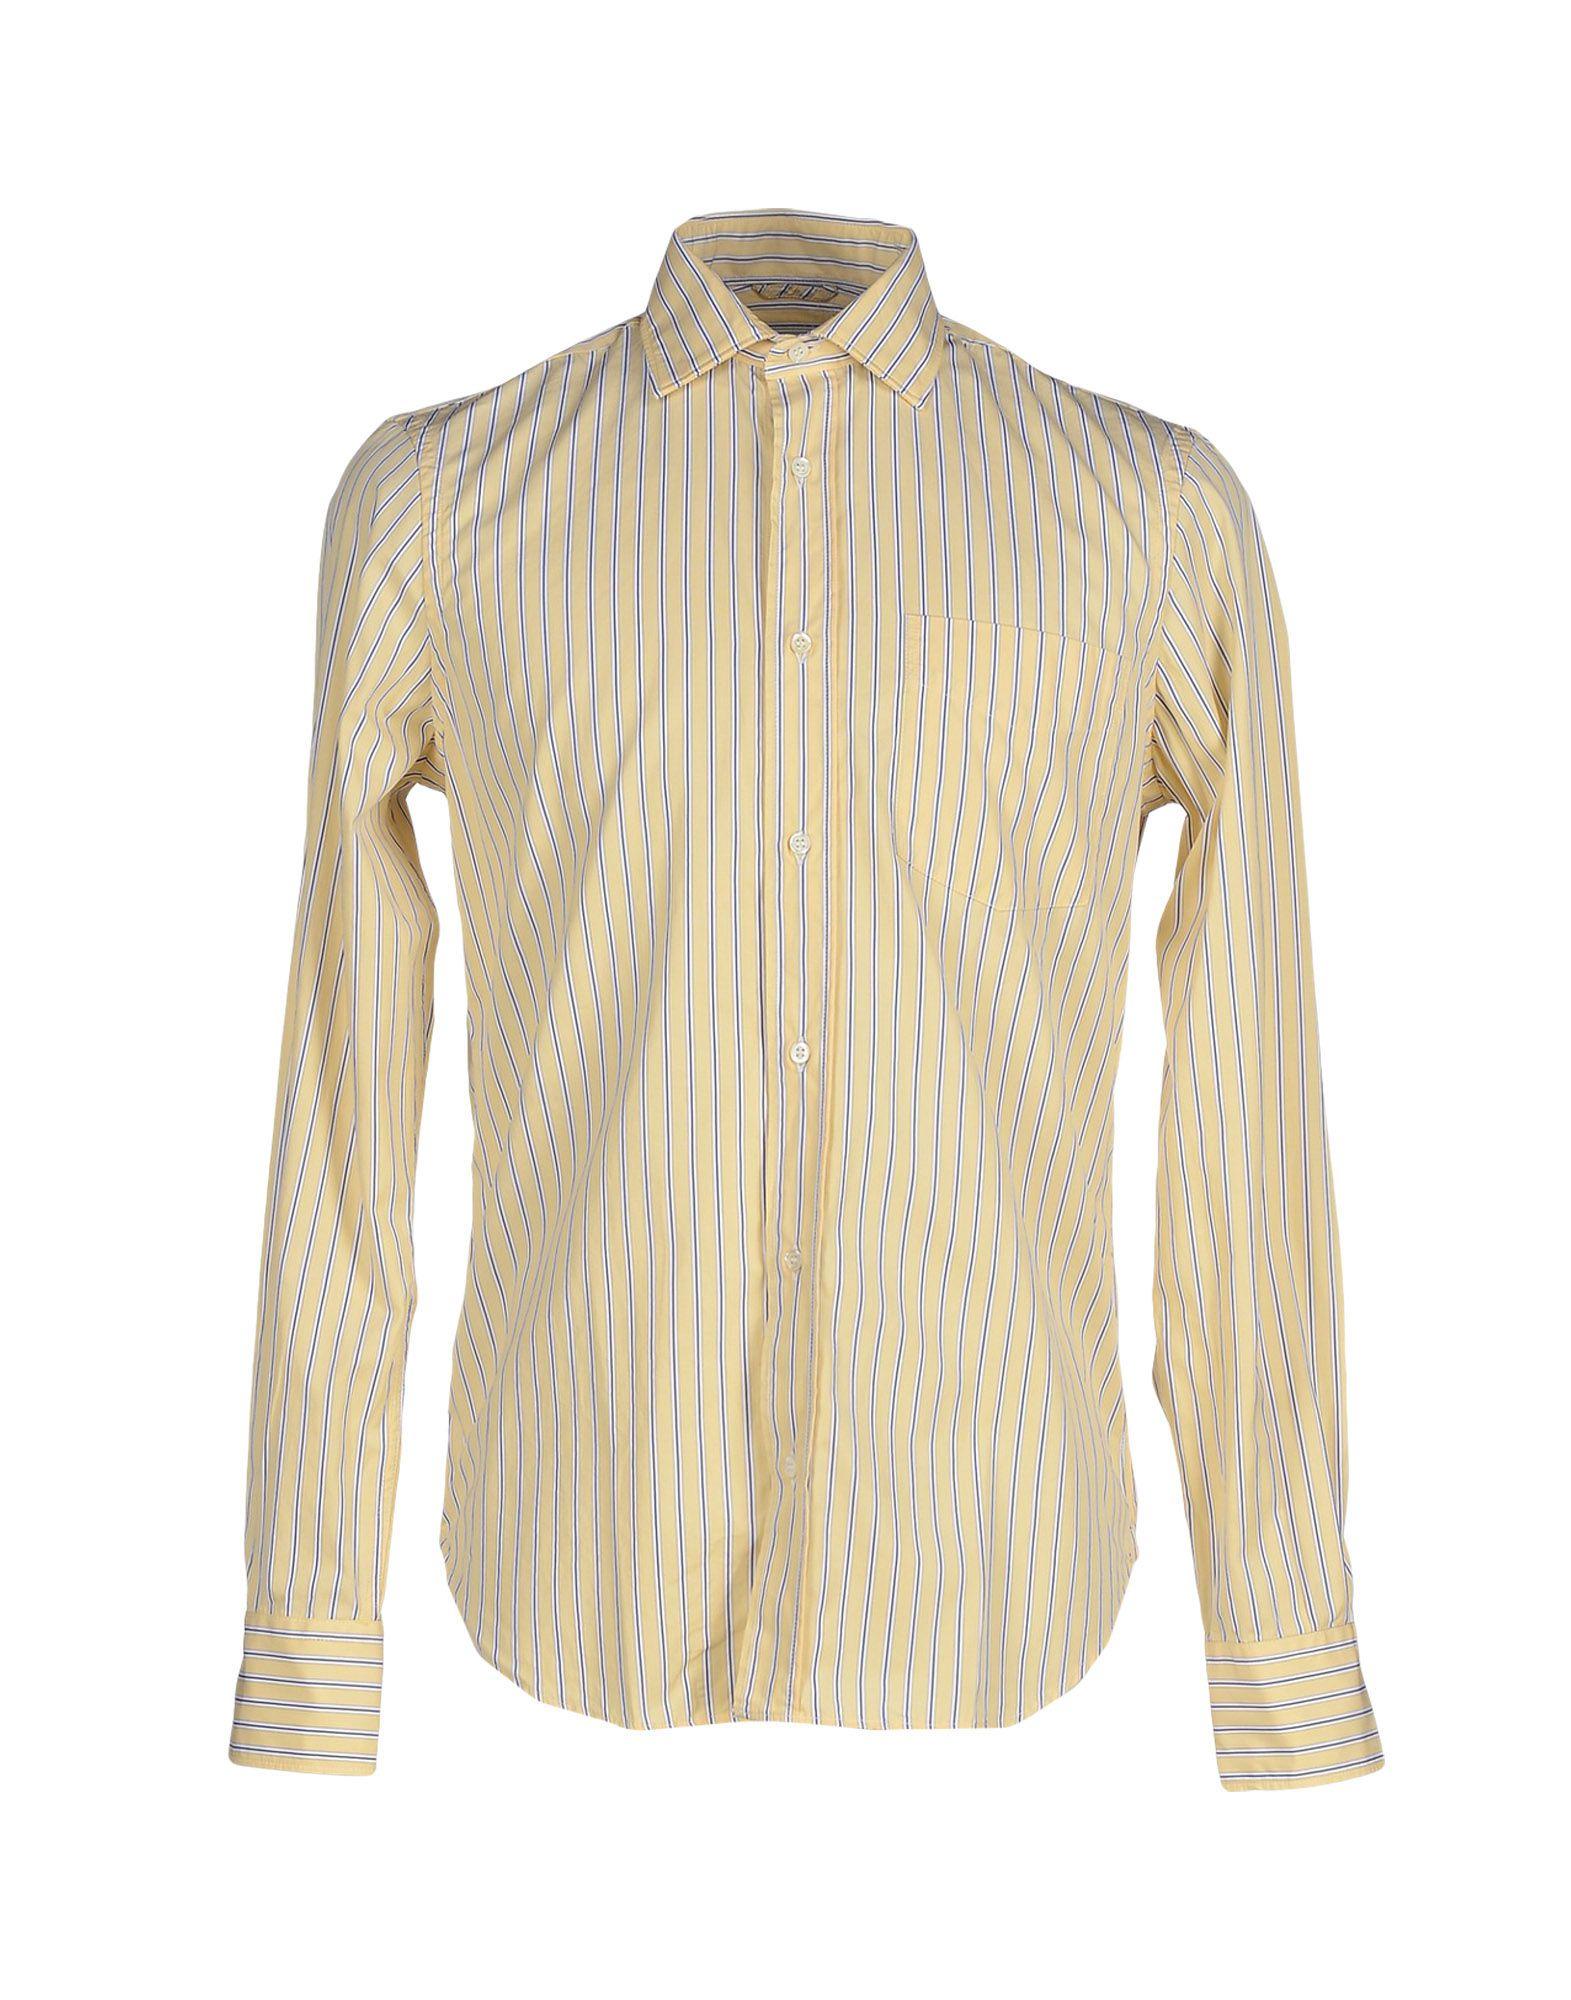 Aspesi Shirt in Natural for Men